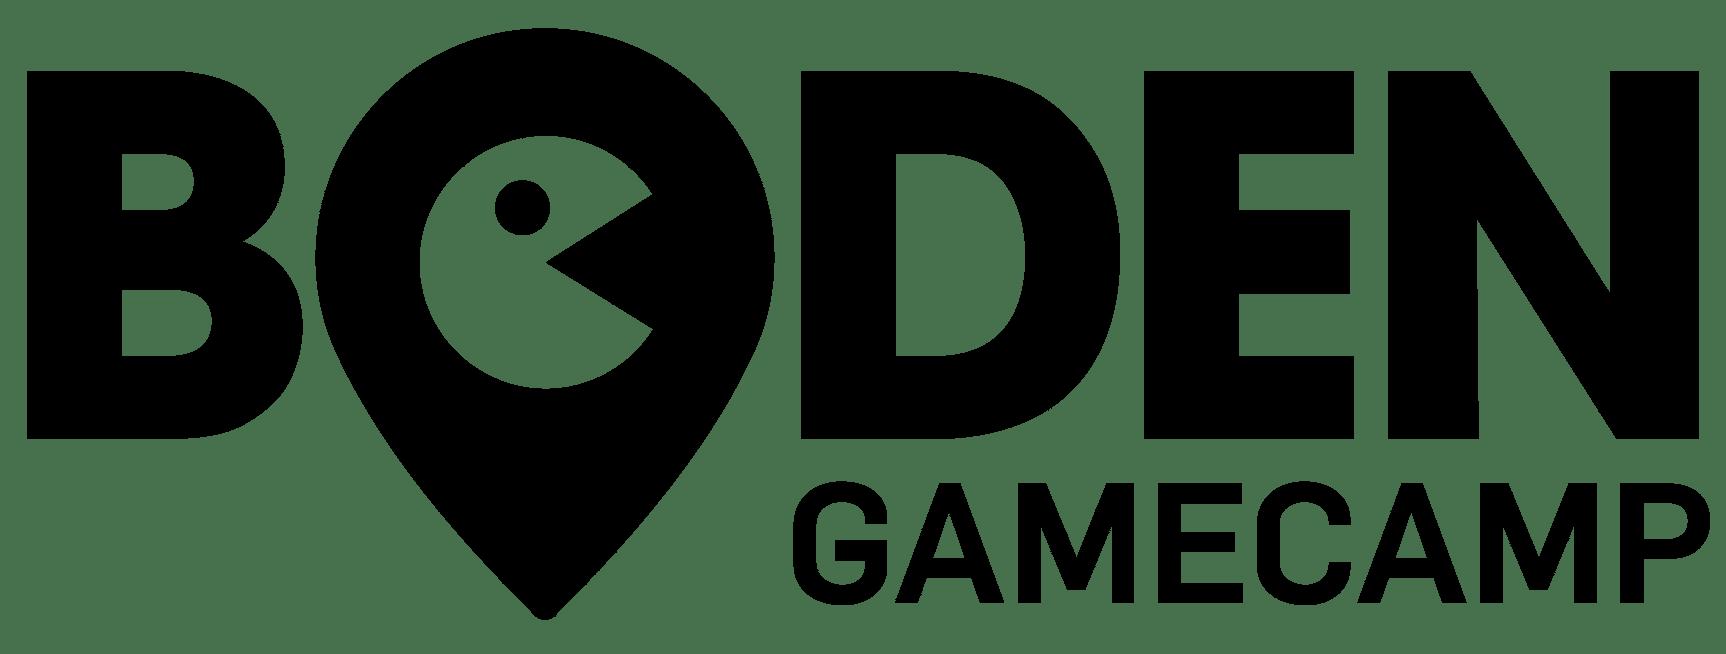 cropped-PVMBoden_GameCamp_Logo_1920